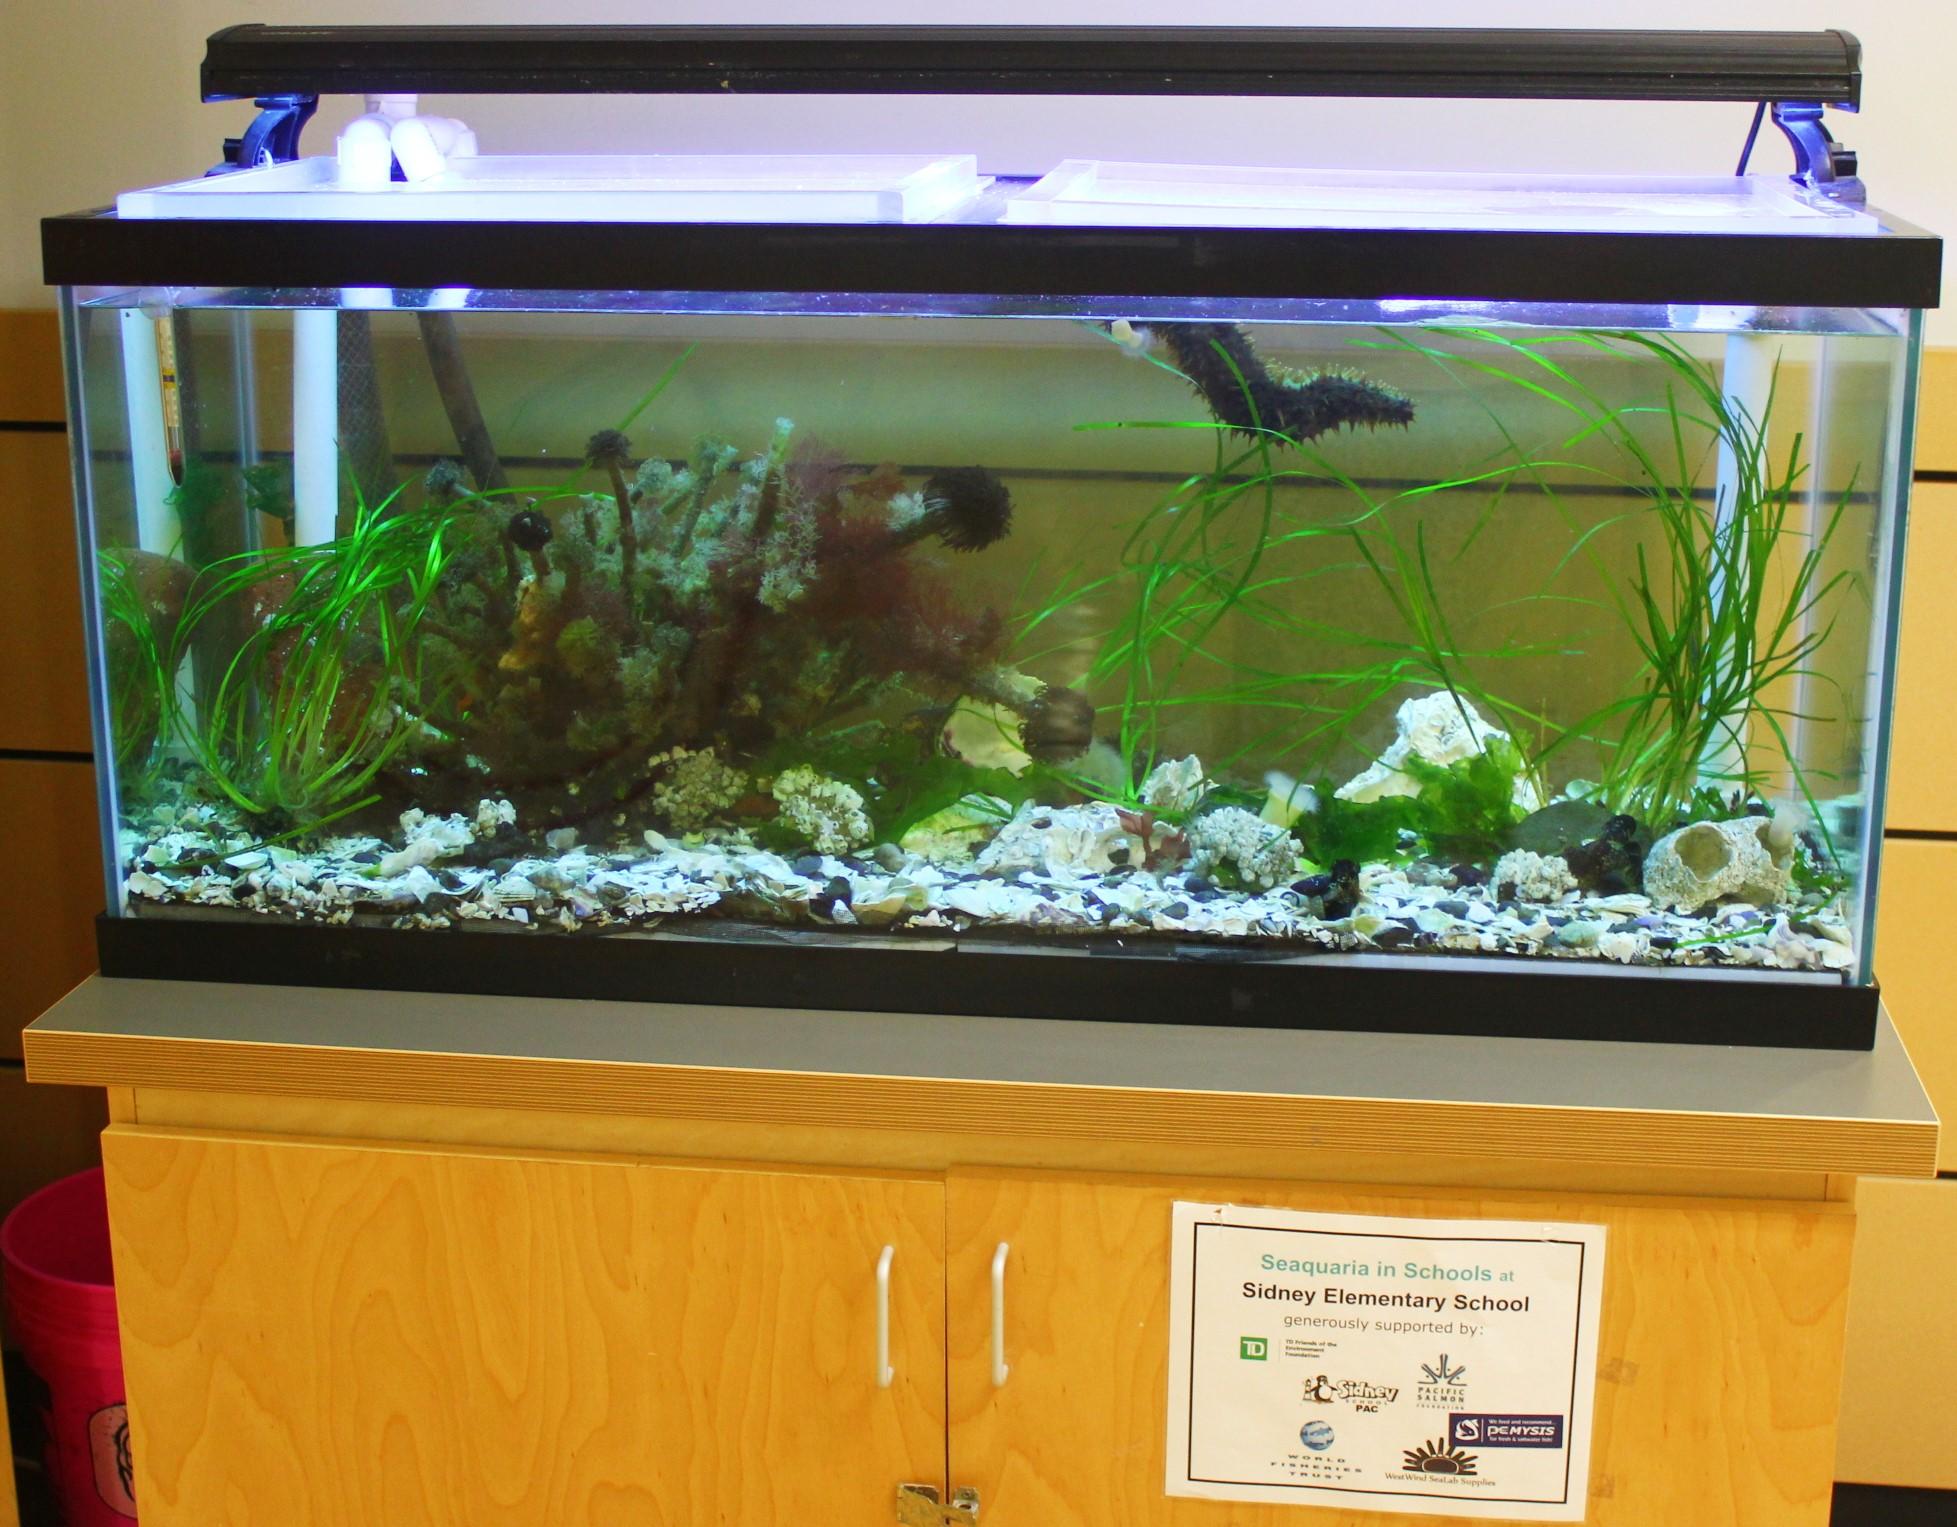 Seaquaria tank